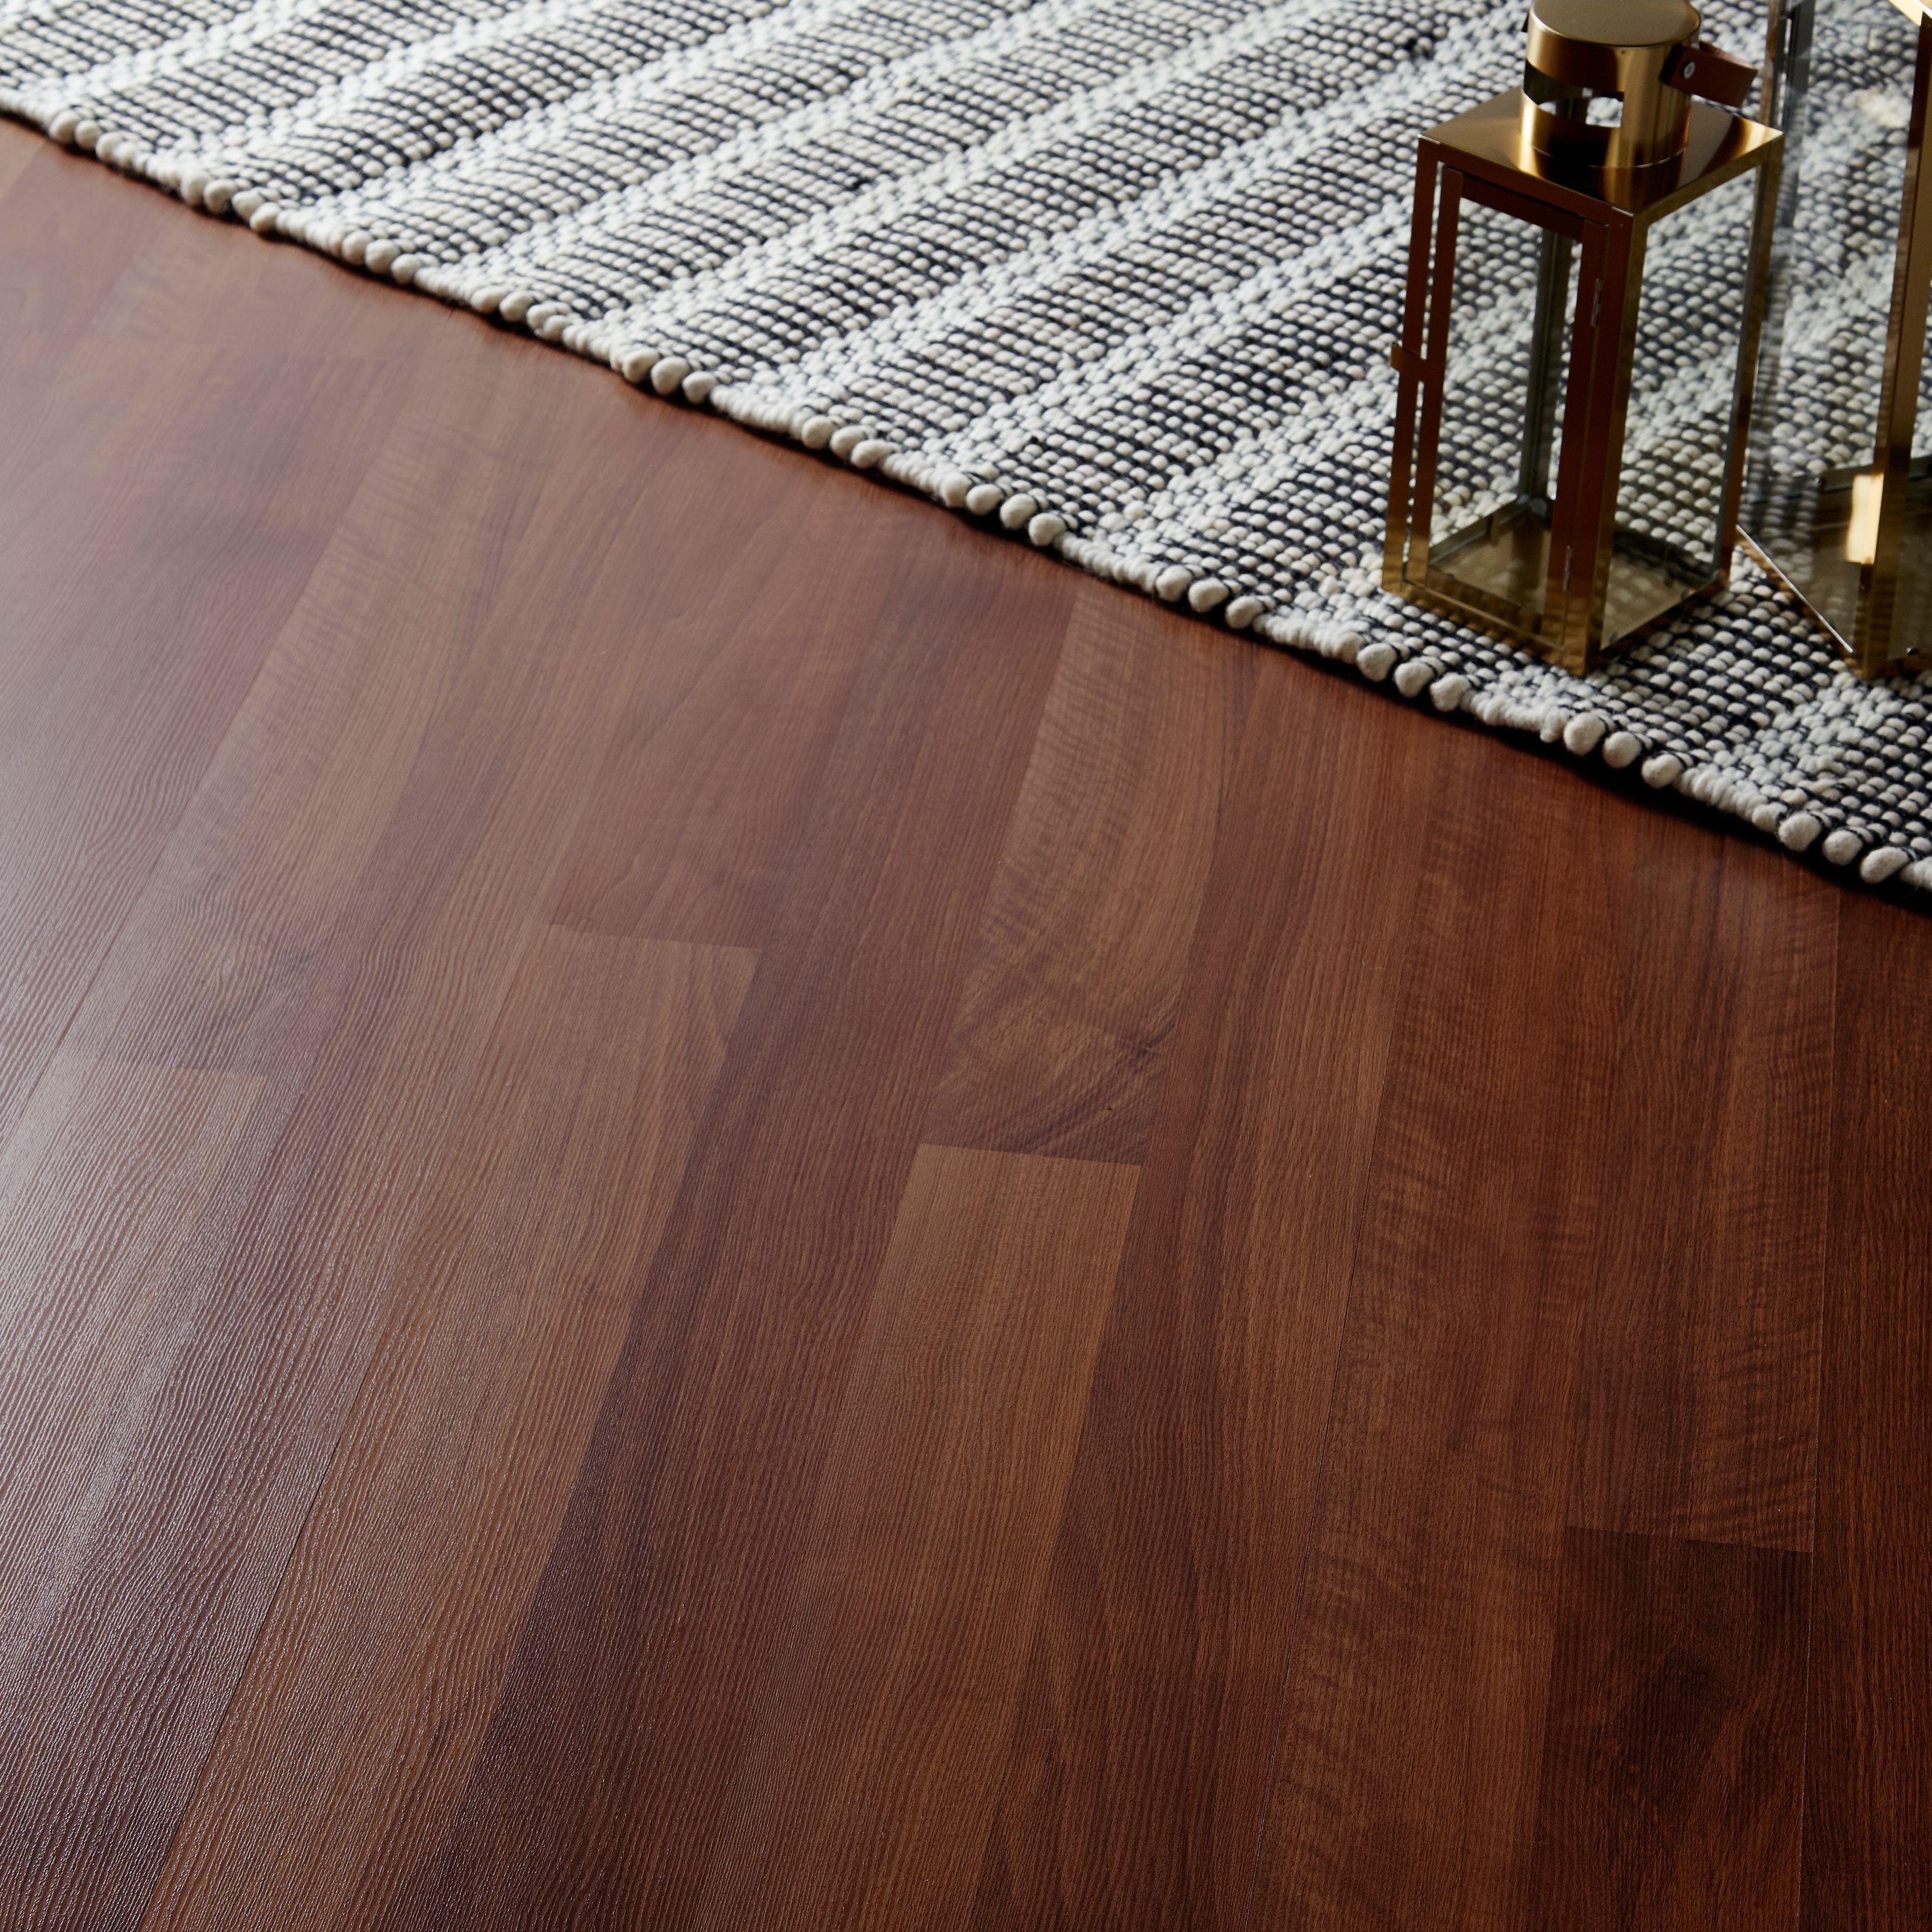 GoodHome Geraldton Natural Walnut Effect Laminate Flooring